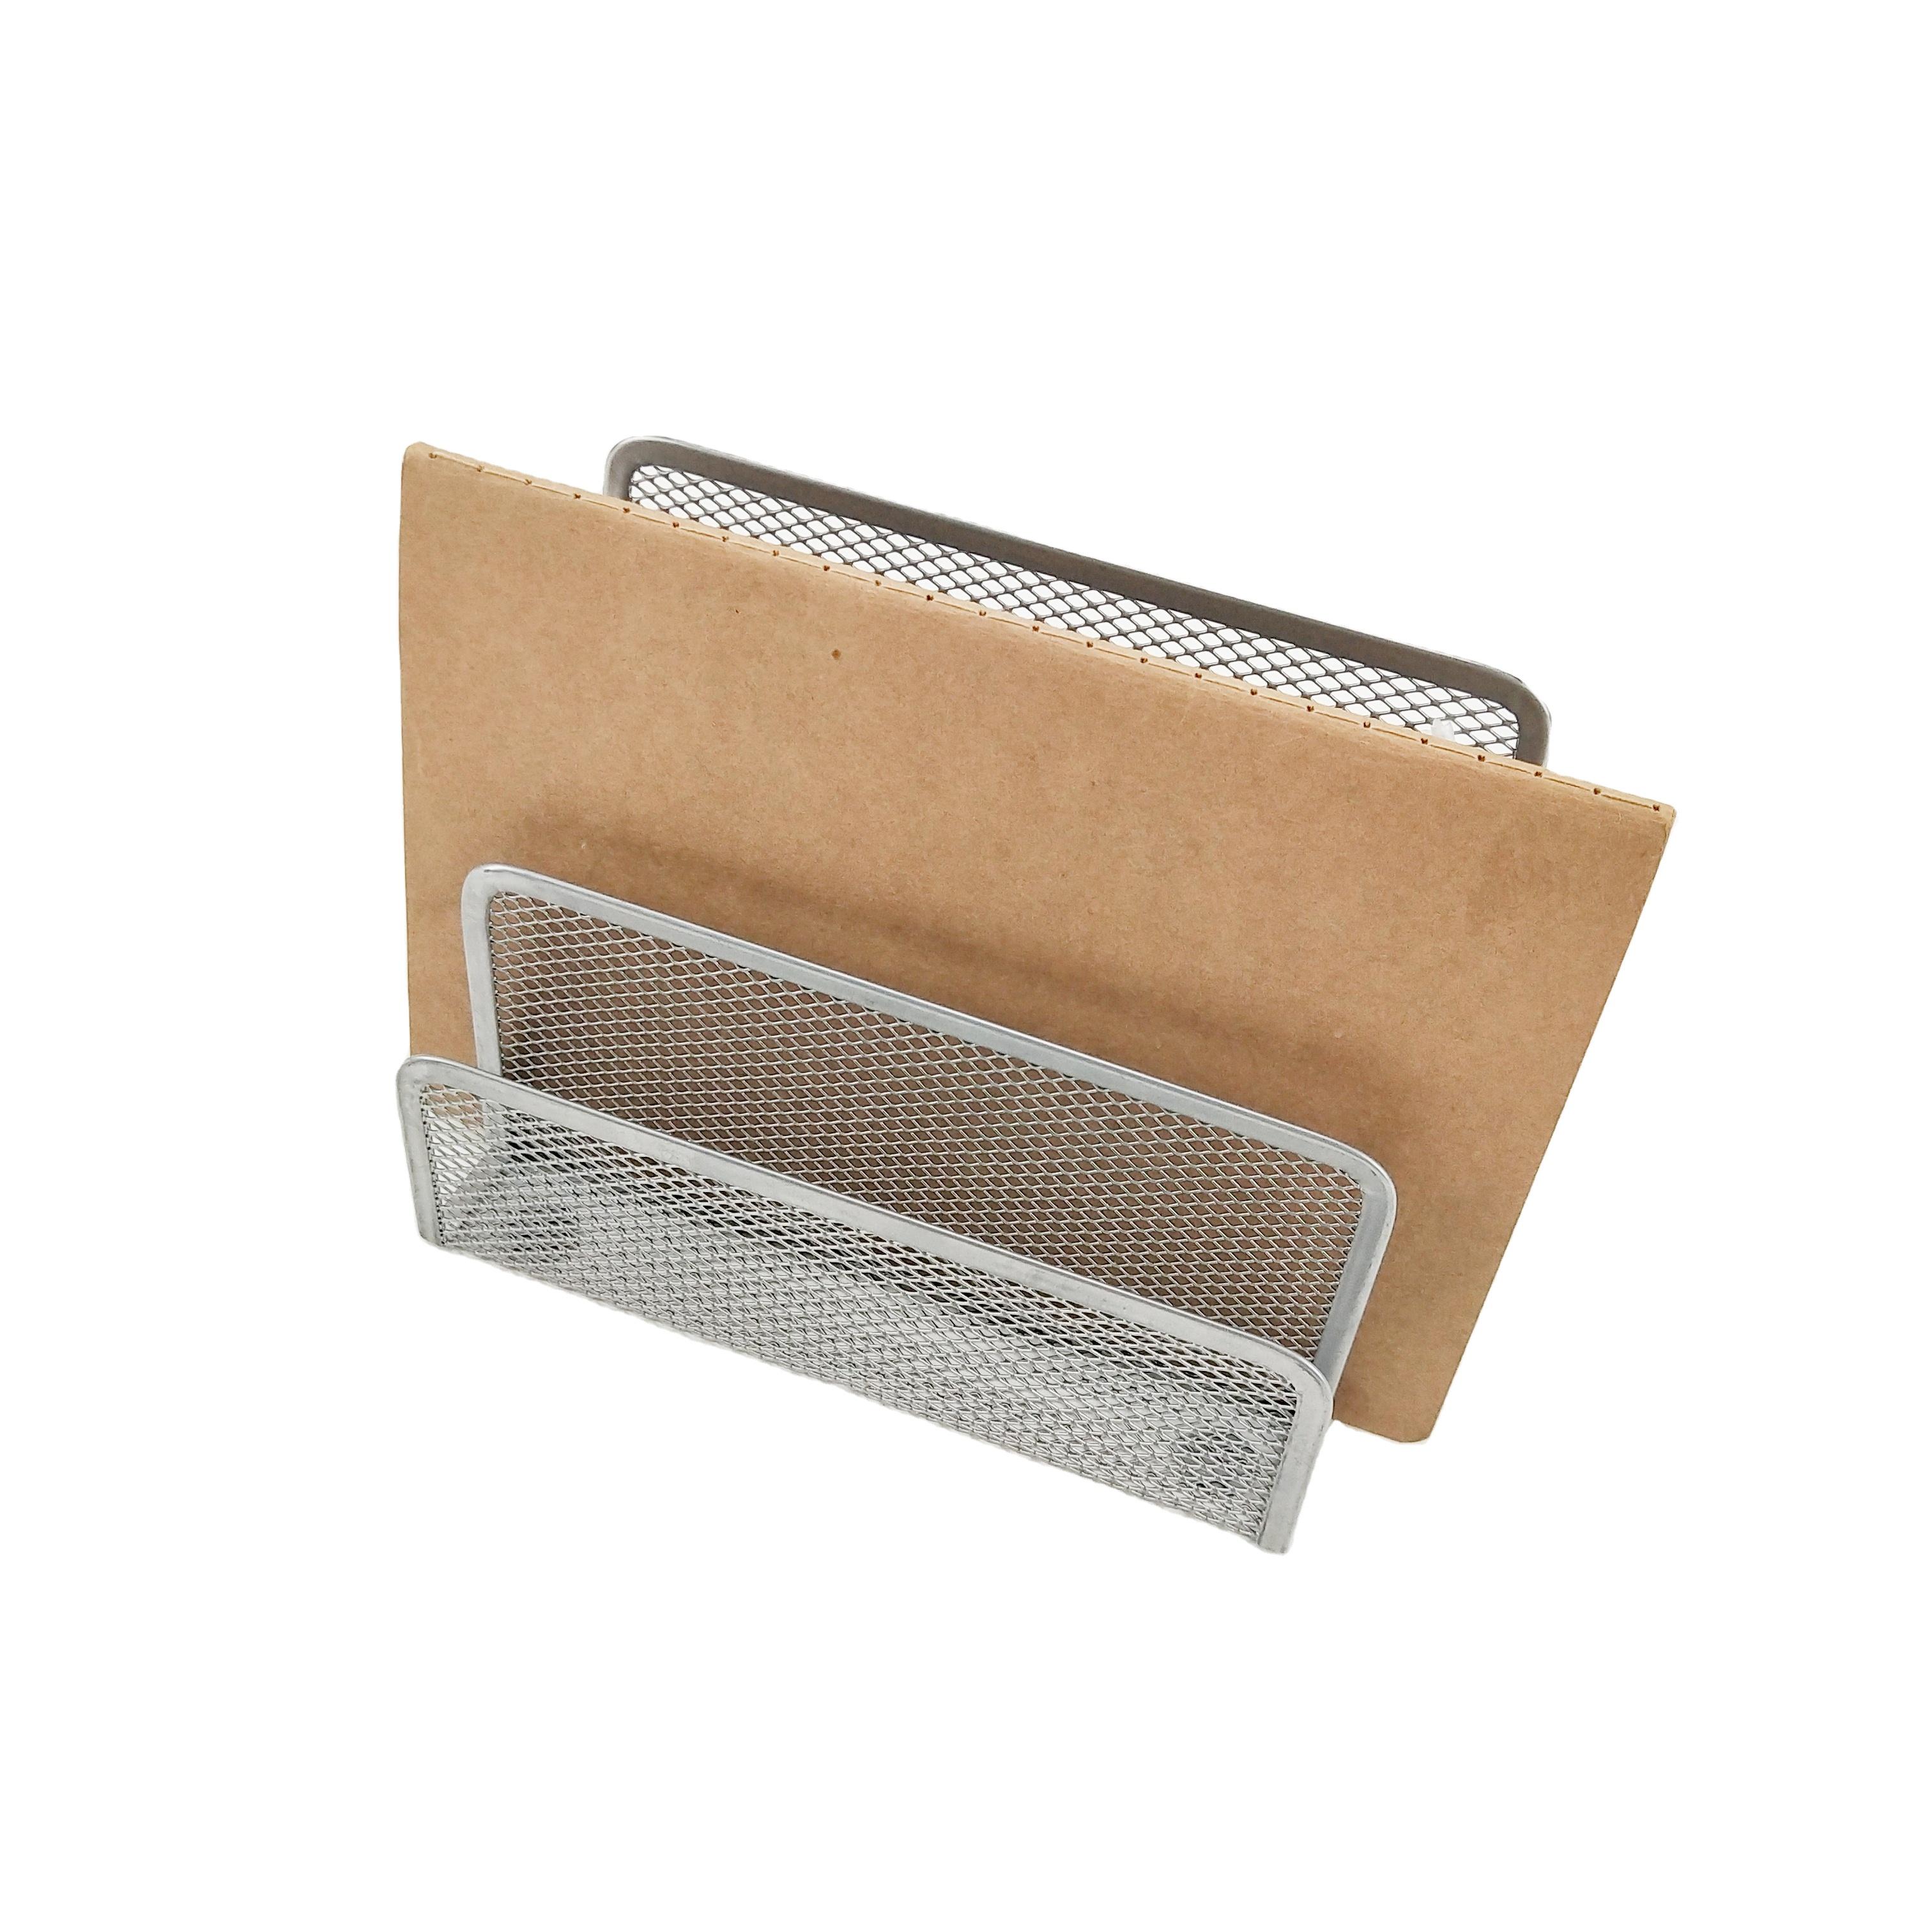 Grey Metal Mesh with 3 Slots Office Supply Organizer Desk Mail Letter Paper Letter Holder Storage Holder Mail Organizer